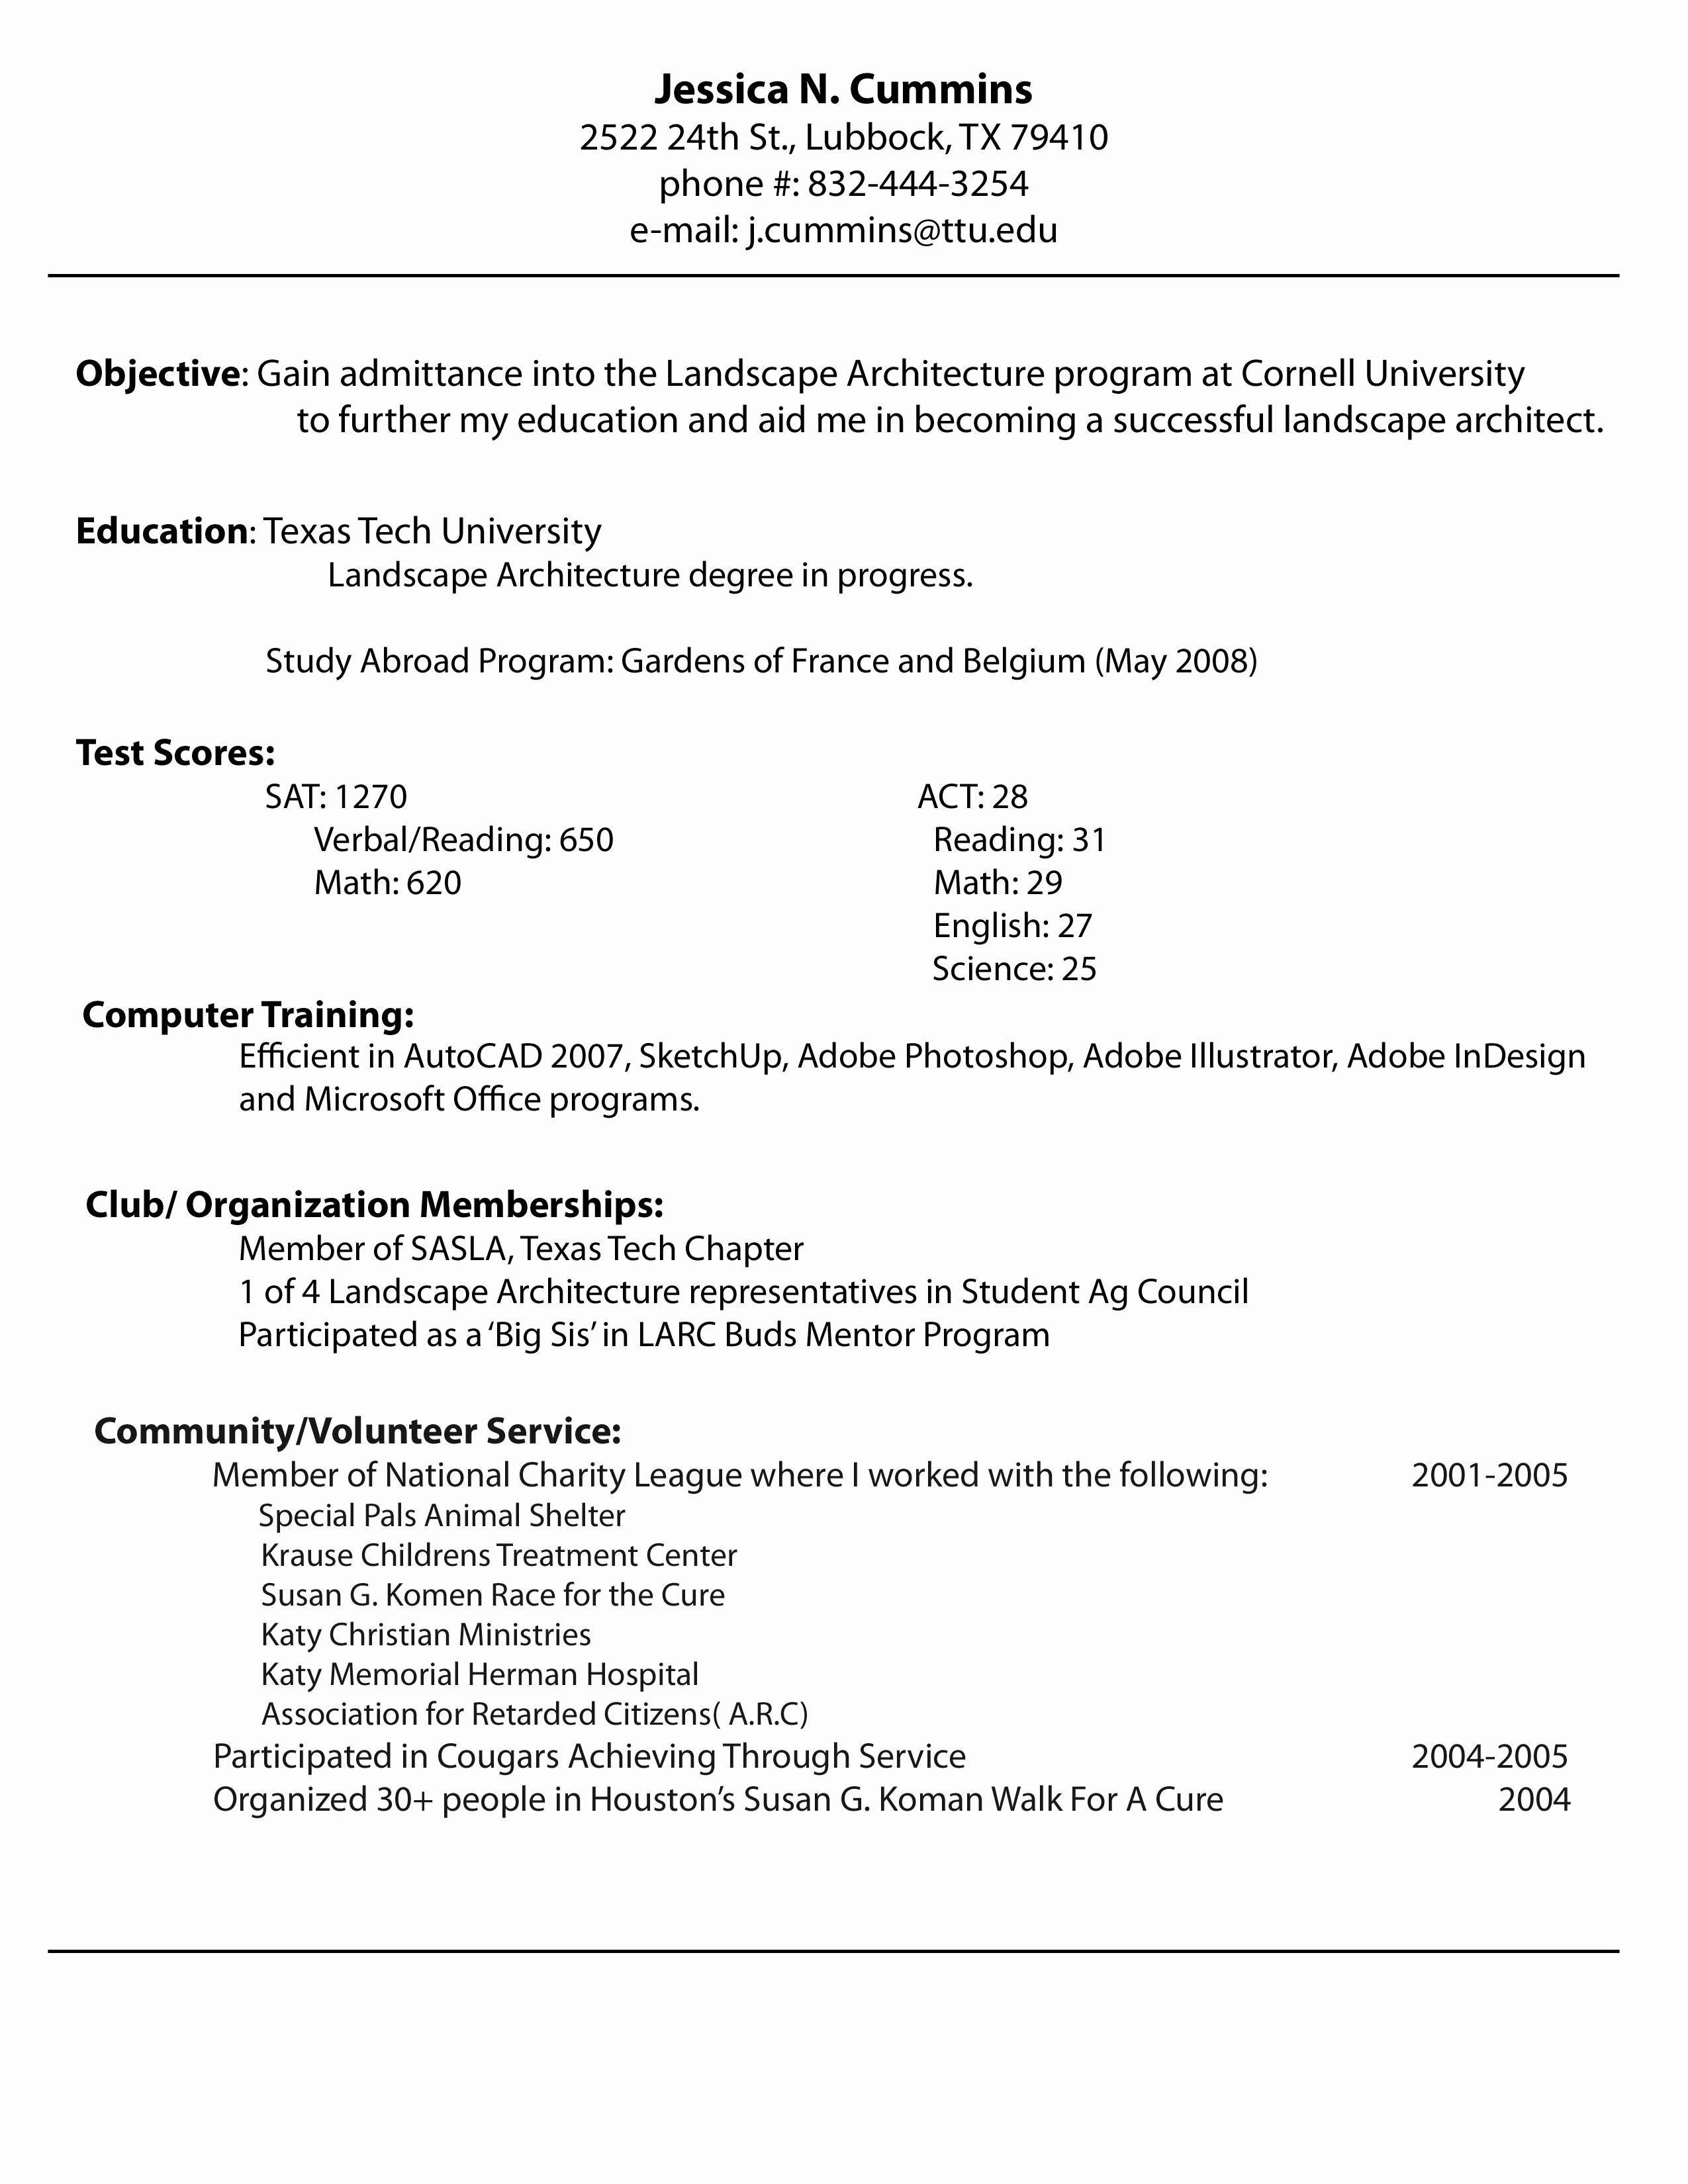 Sample Resume Xls Format 3 Resume Format Pinterest Sample